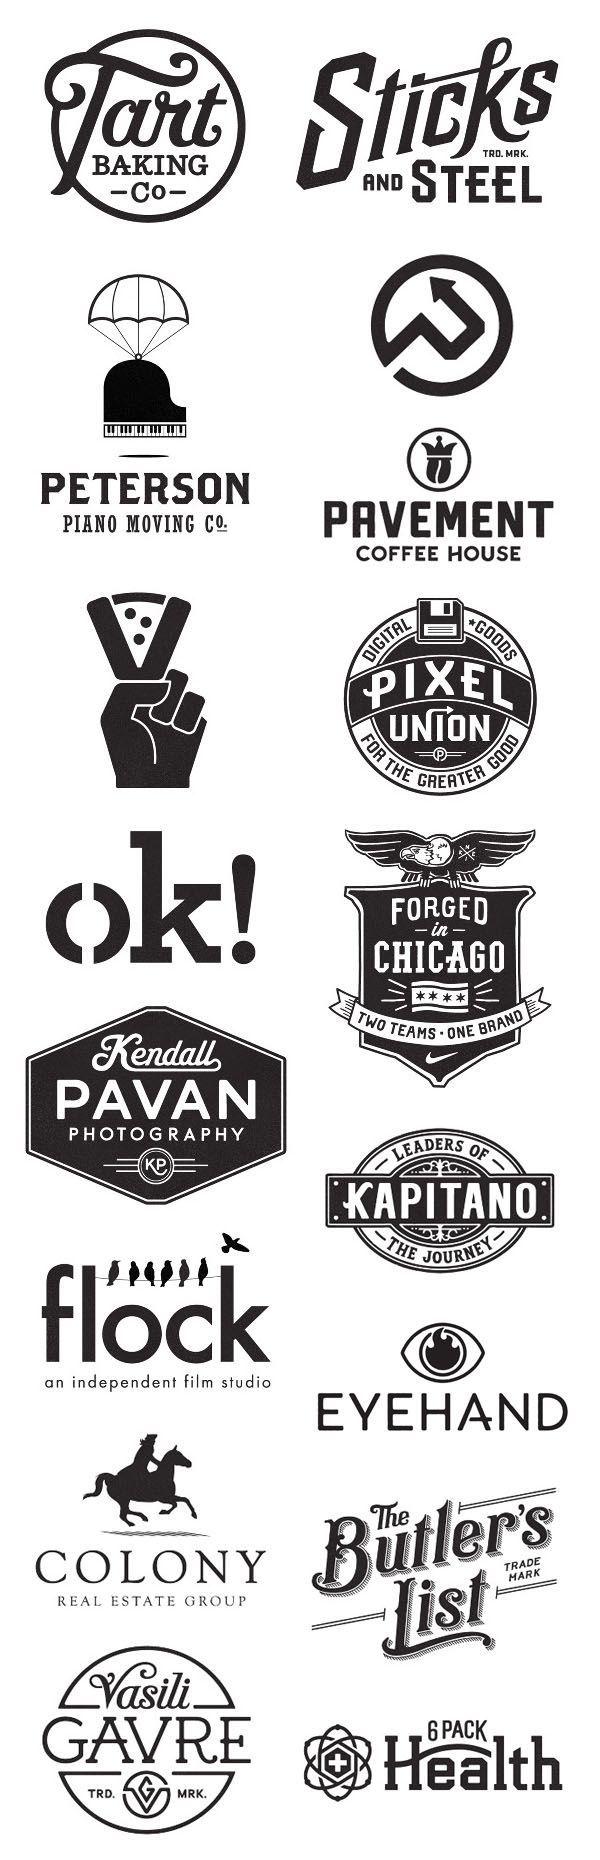 Tart Baking Co. + Vasili Gavre. Script font and block lettering. Simple circular logo. Logo designs by Commoner, Inc